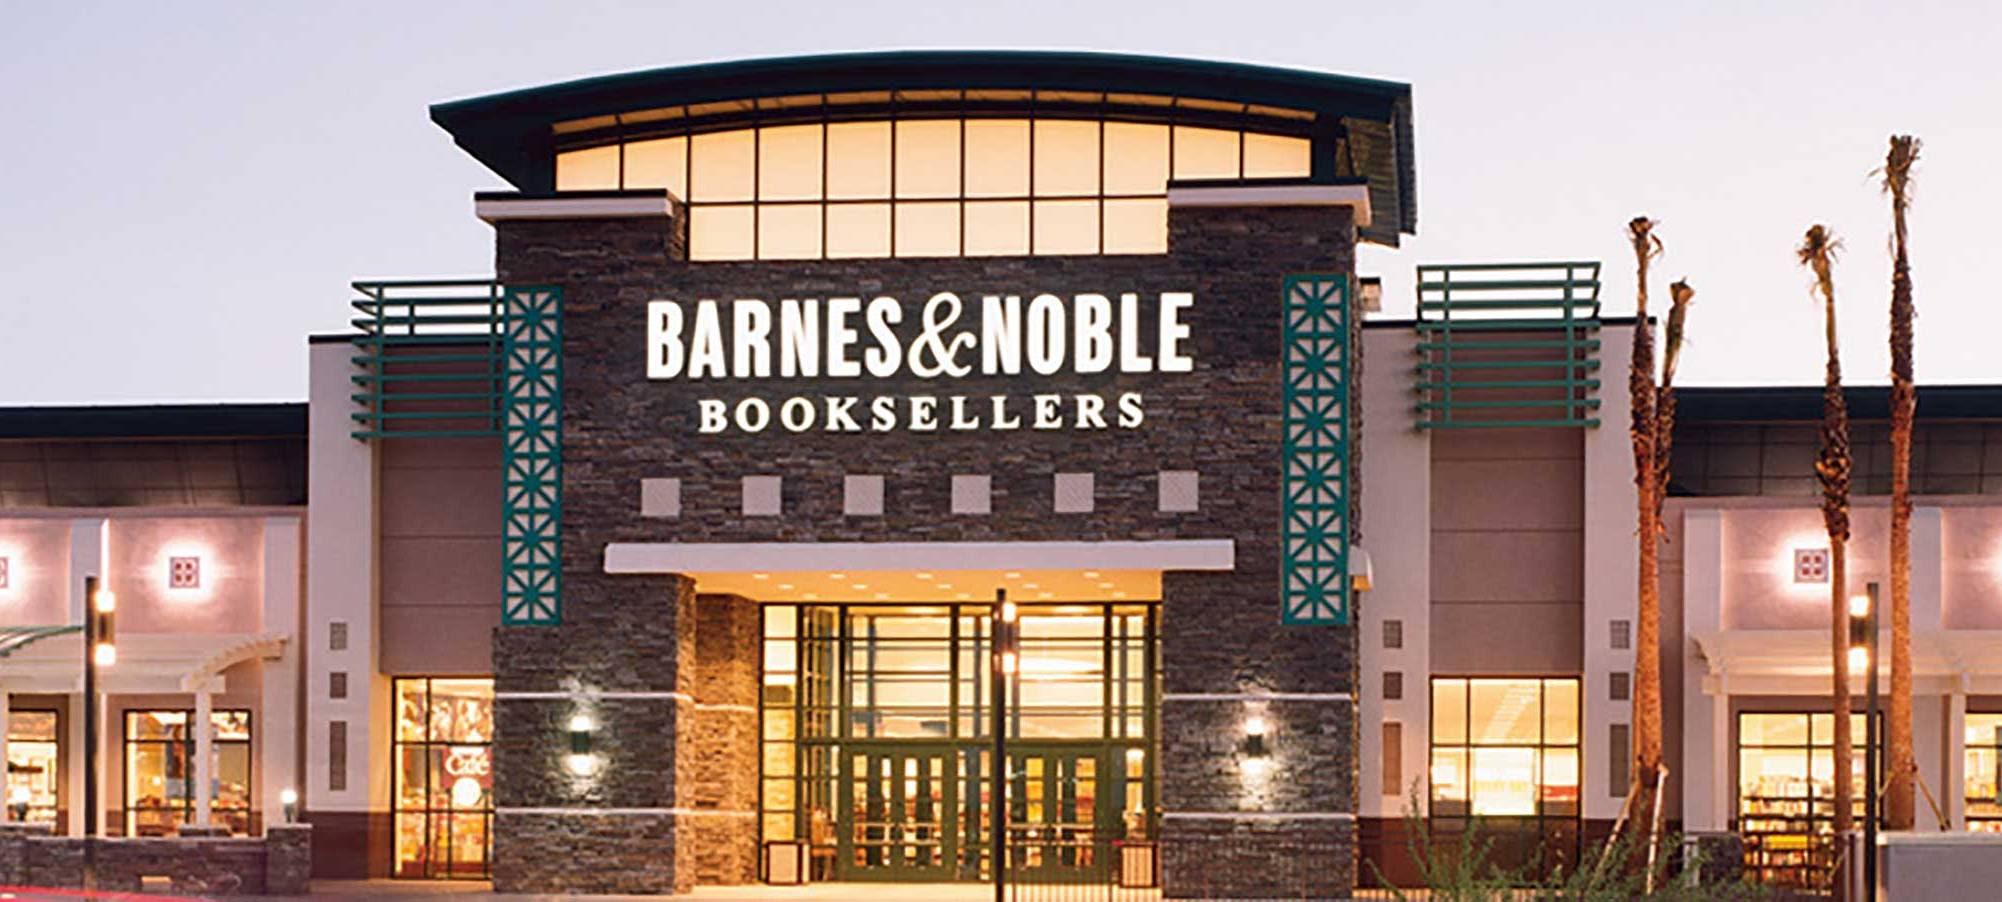 Back to Books at Barnes Noble Shelf Awareness